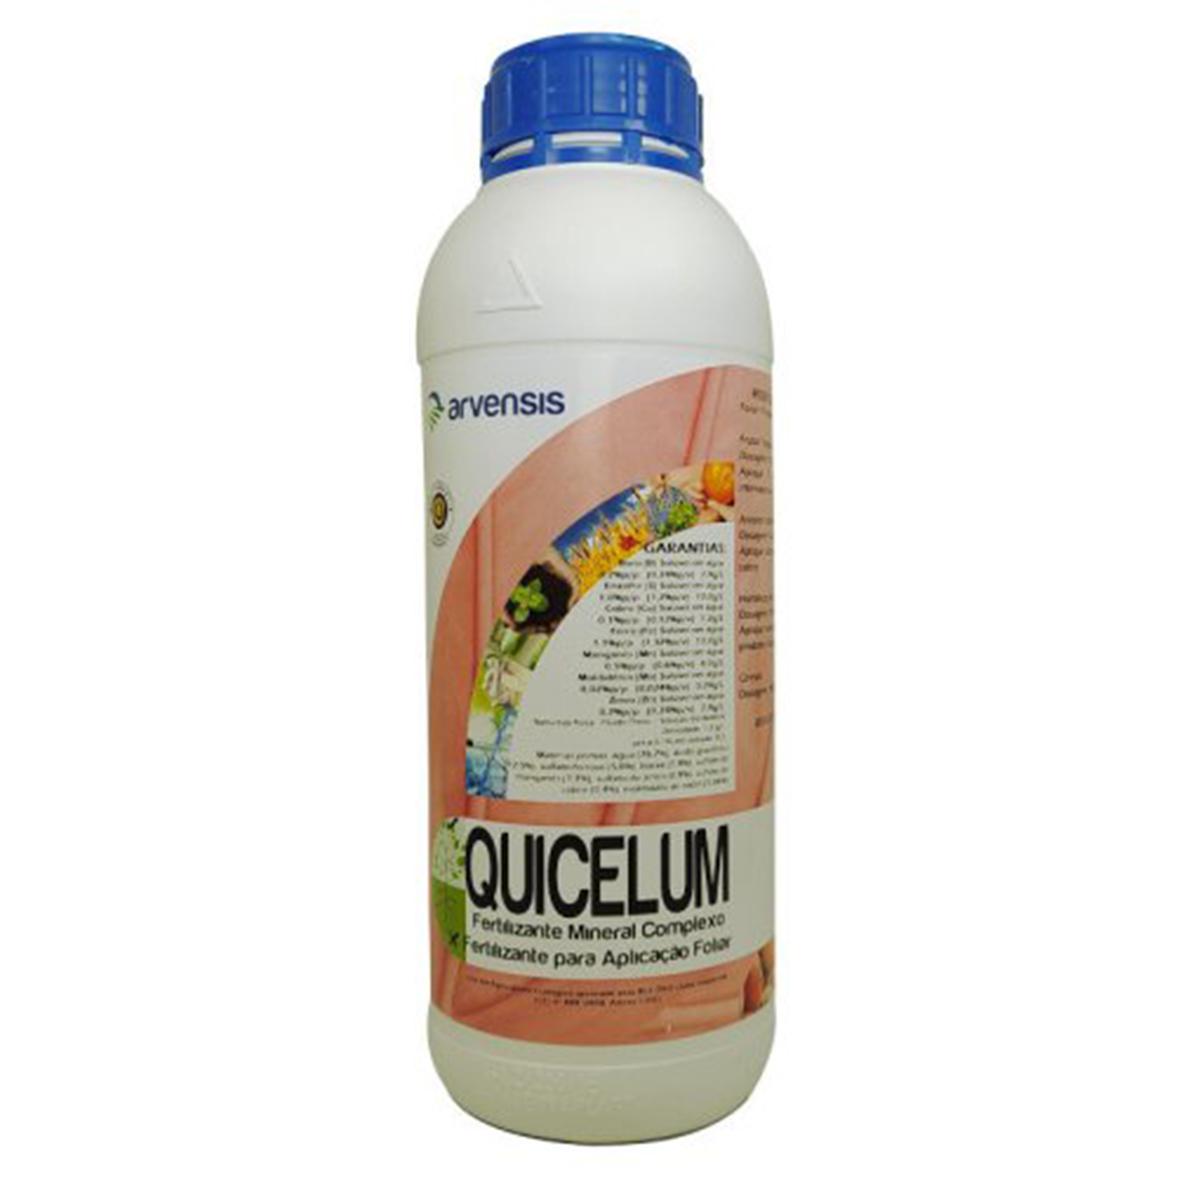 QUICELUM 1 LITRO (Bioativador, Bioestimulante E Bioregulador)